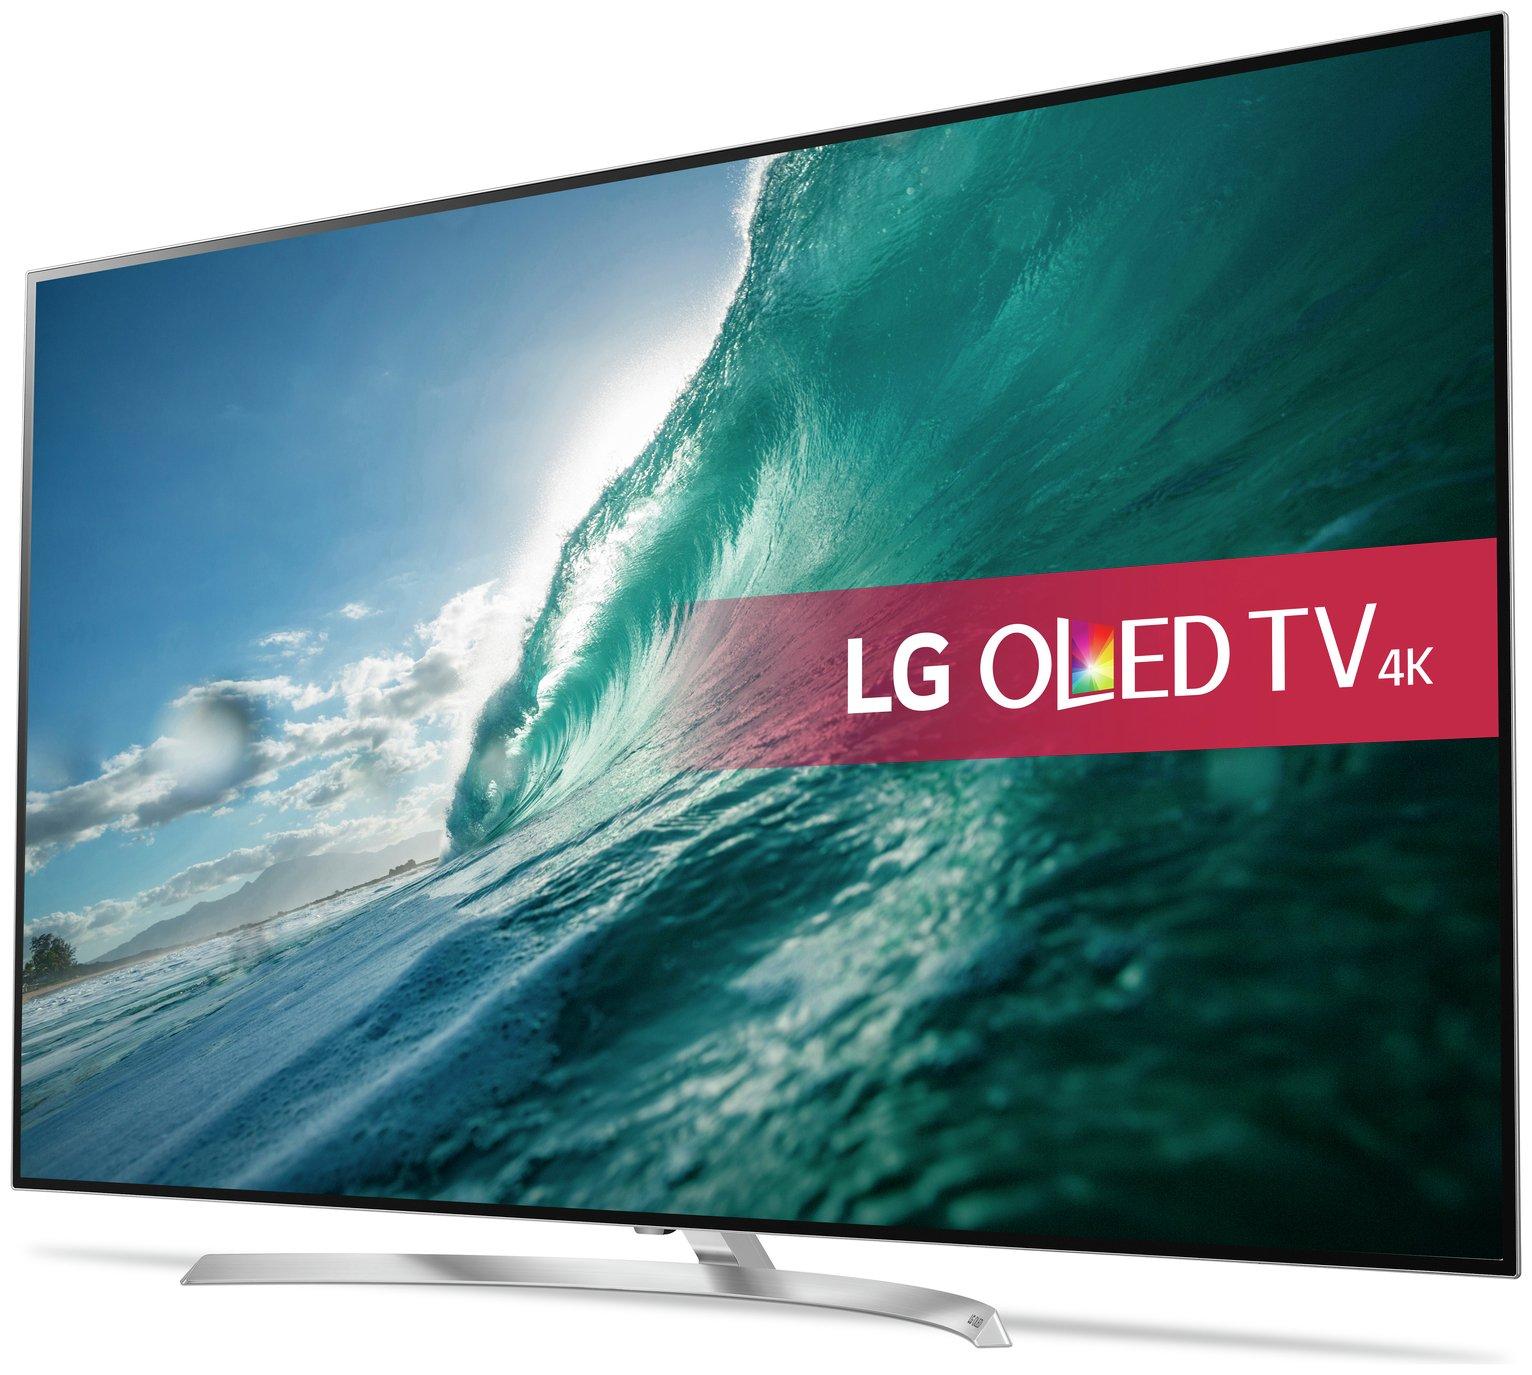 LG LG OLED55B7V 55 Inch Smart OLED 4K Ultra HD TV with HDR